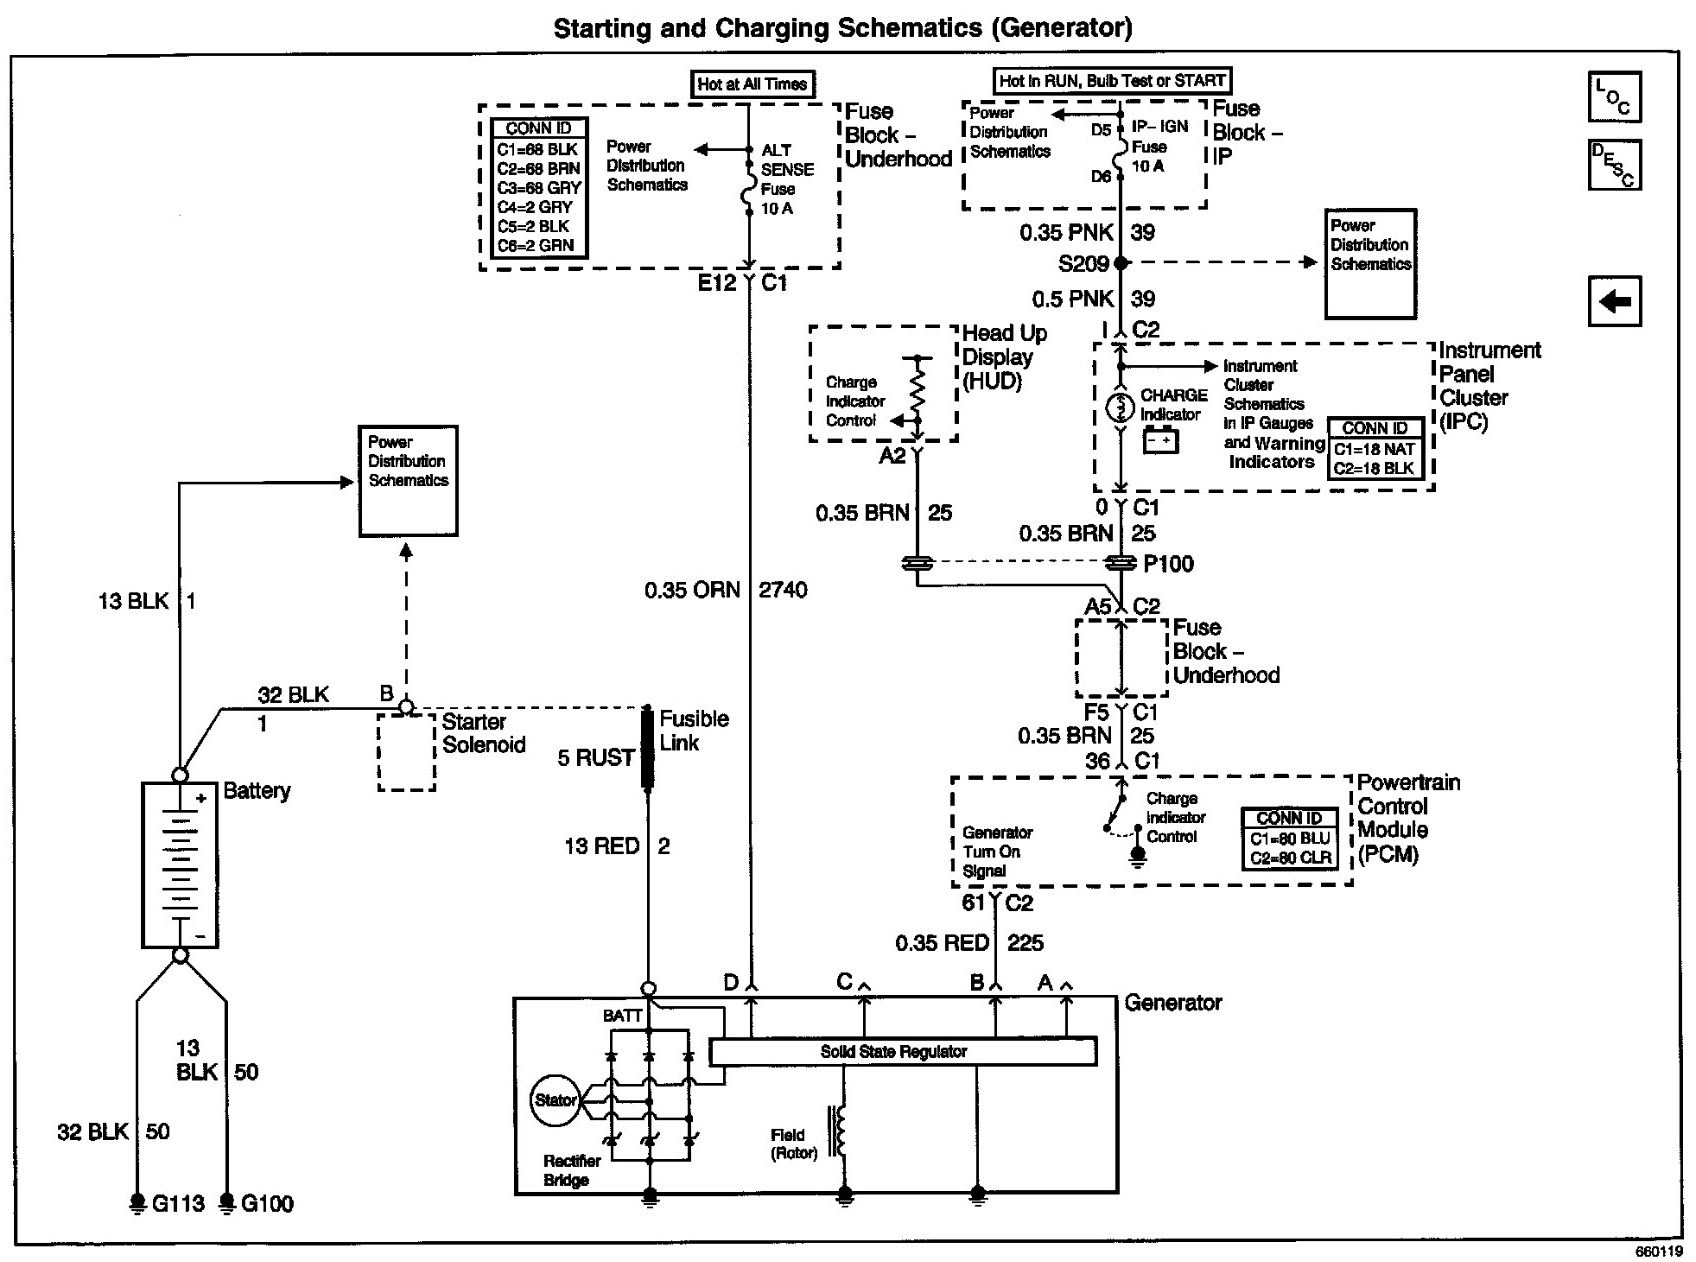 6699 2002 Pontiac Grand Prix Starter Wiring Diagram Wiring Library